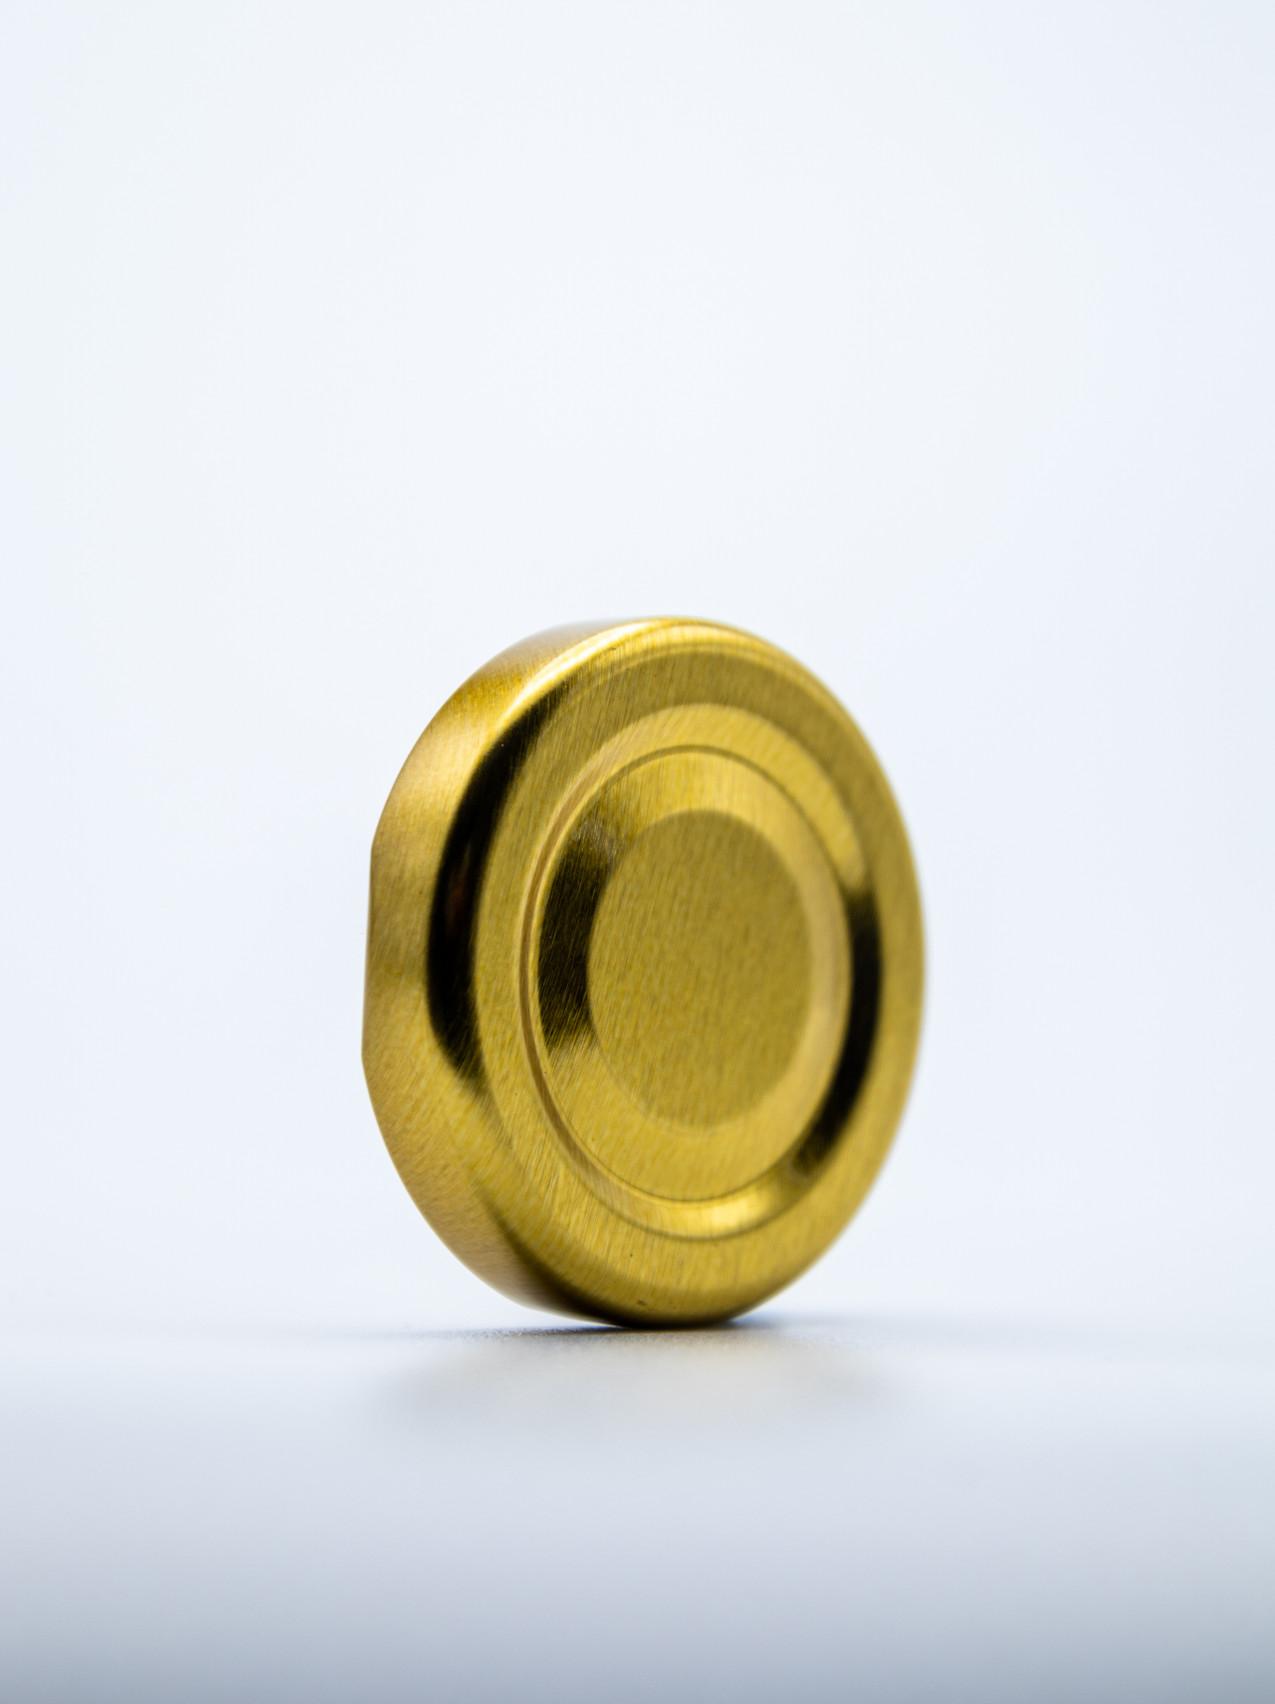 The 43mm Gold Cap